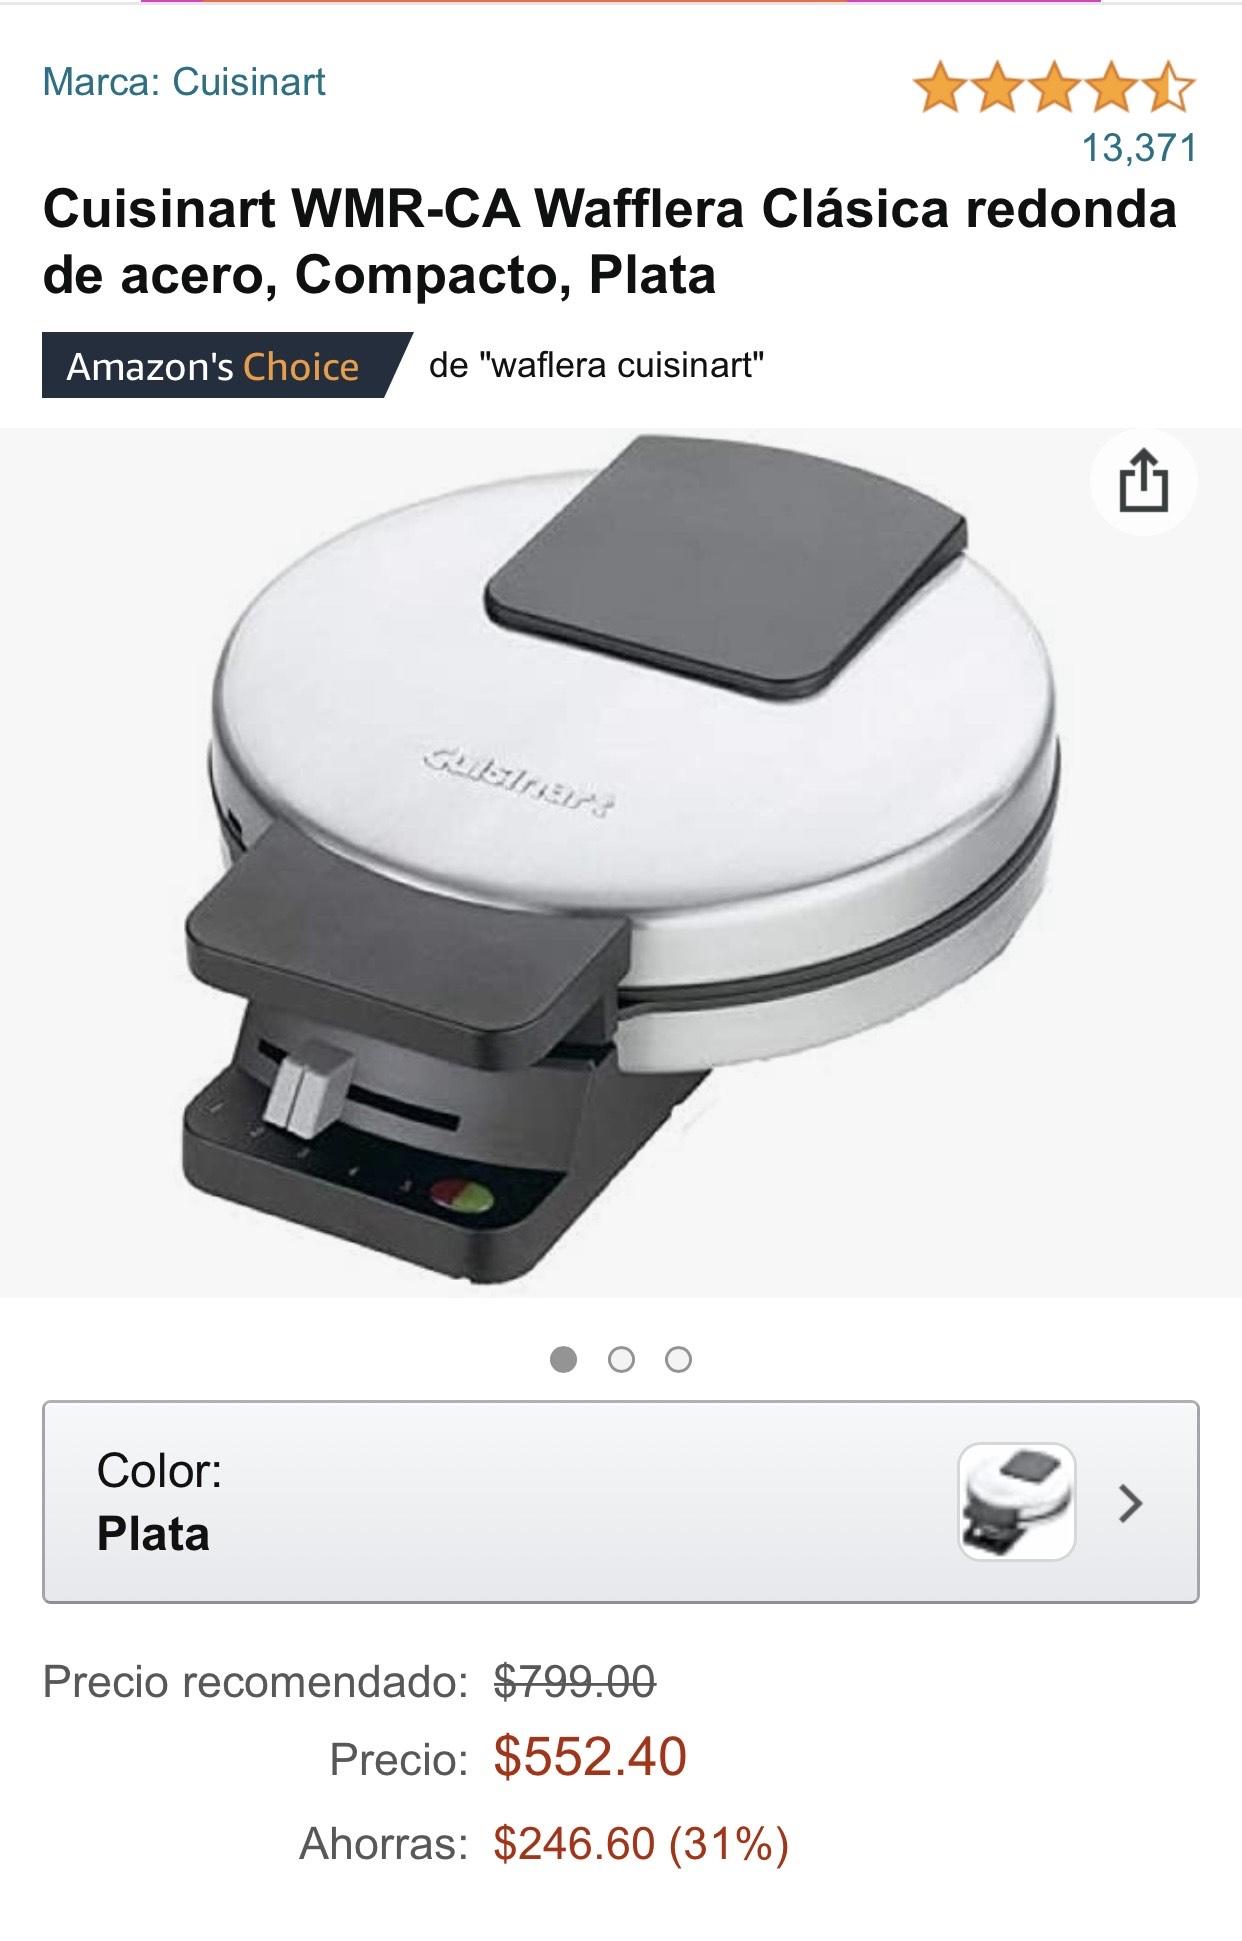 Amazon Wafflera cuisinart clásica de acero.